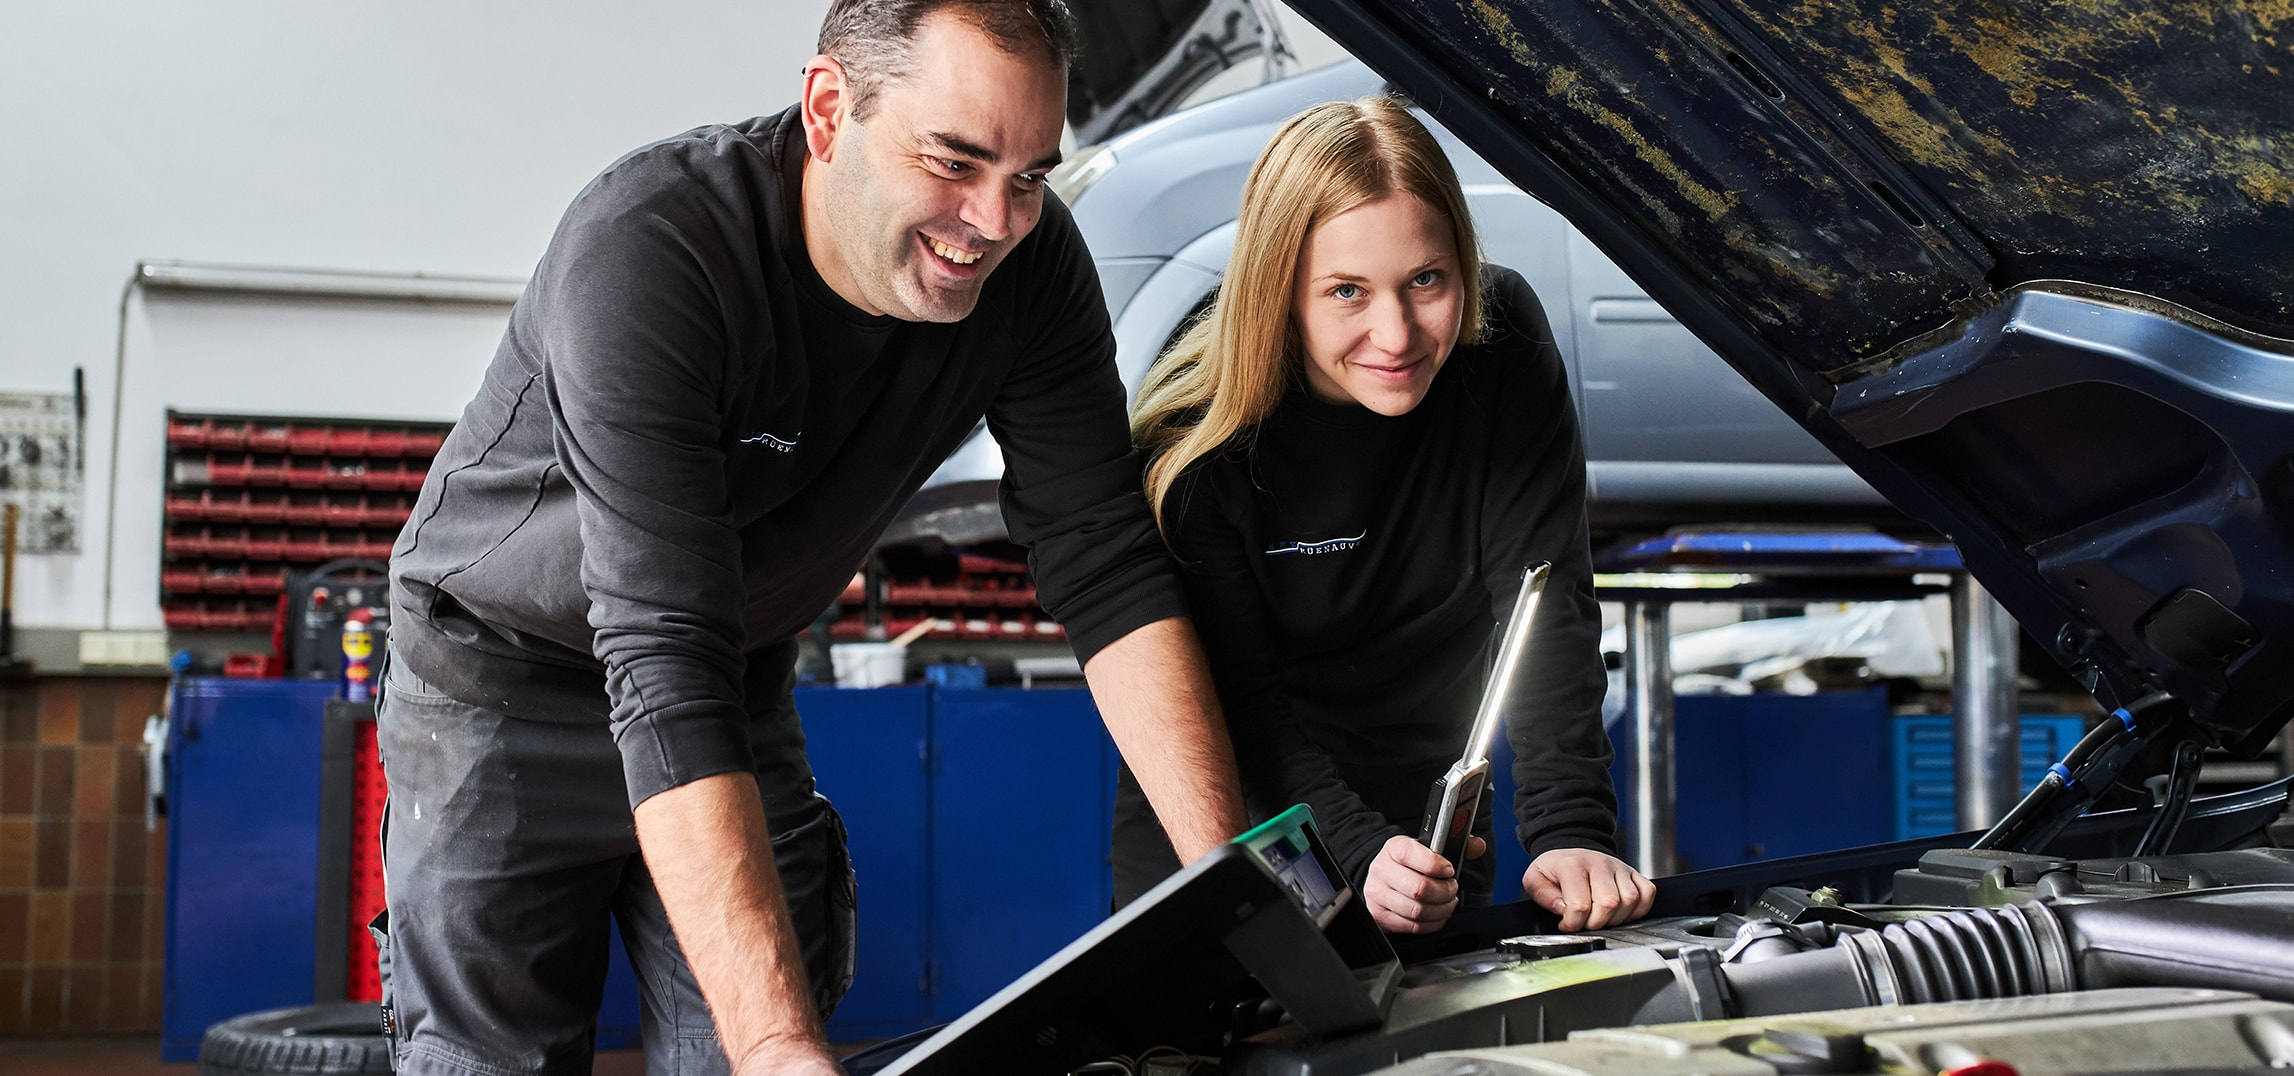 kfz-rueenauver-werkstatt-reparatur-mitarbeiter-auto